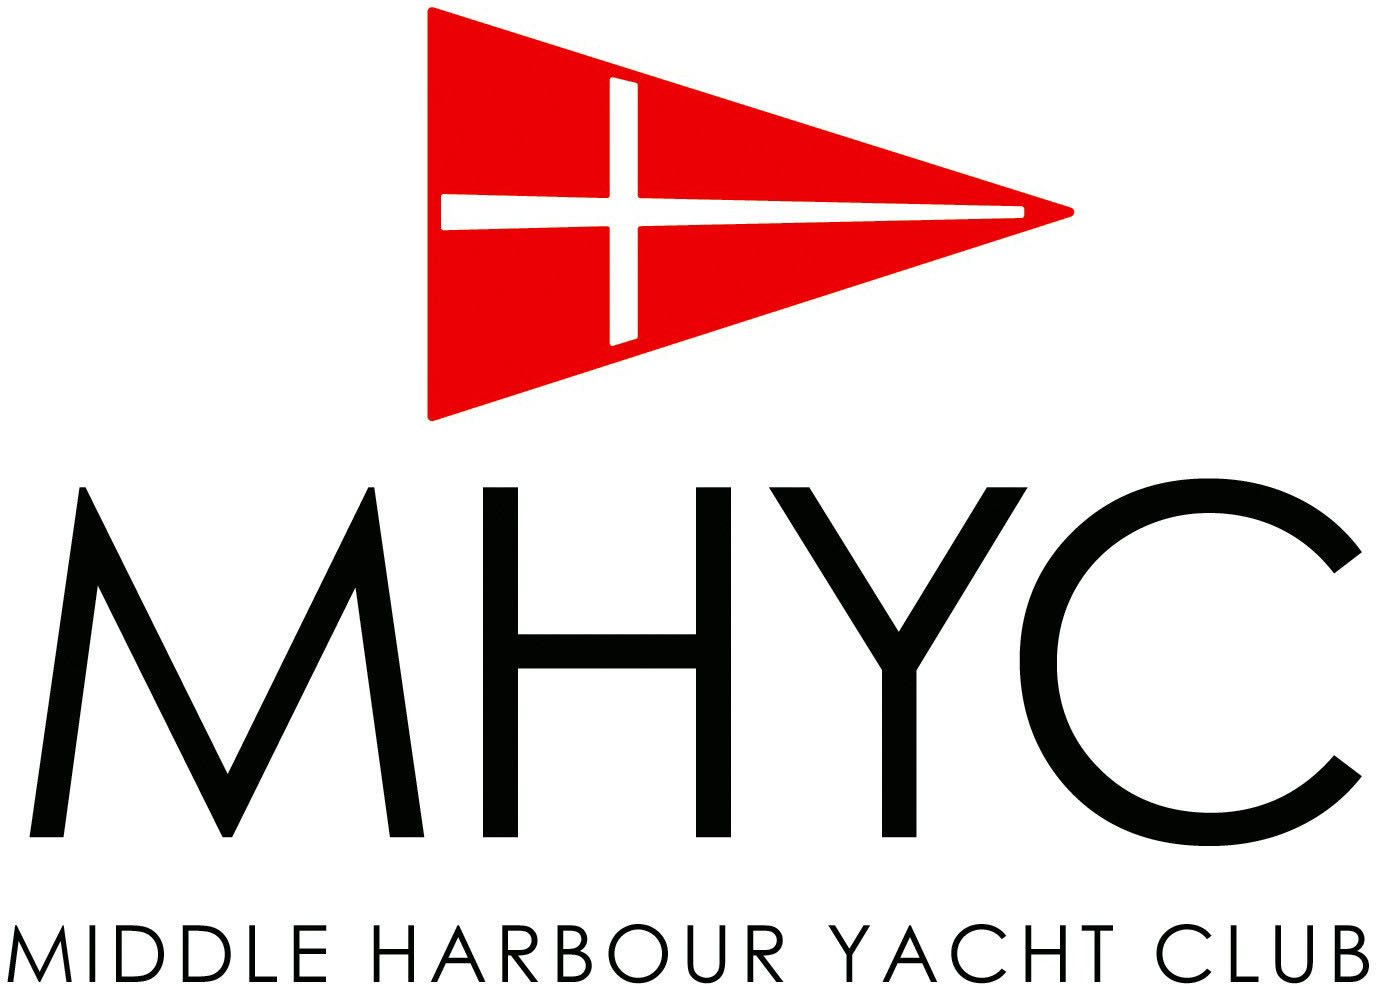 MHYC_02_RGB